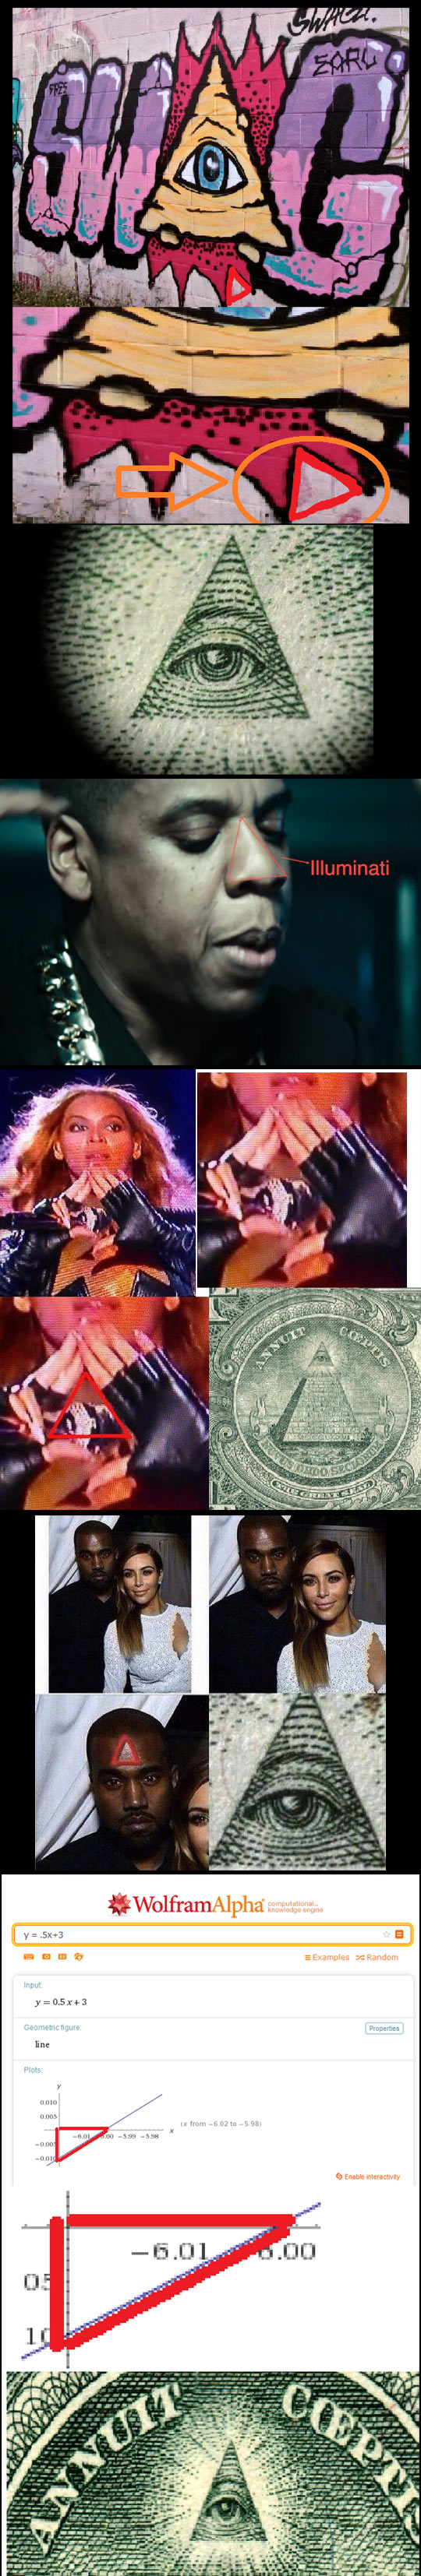 funny-Illuminati-conspiracy-triangle-games-dollar-graffiti